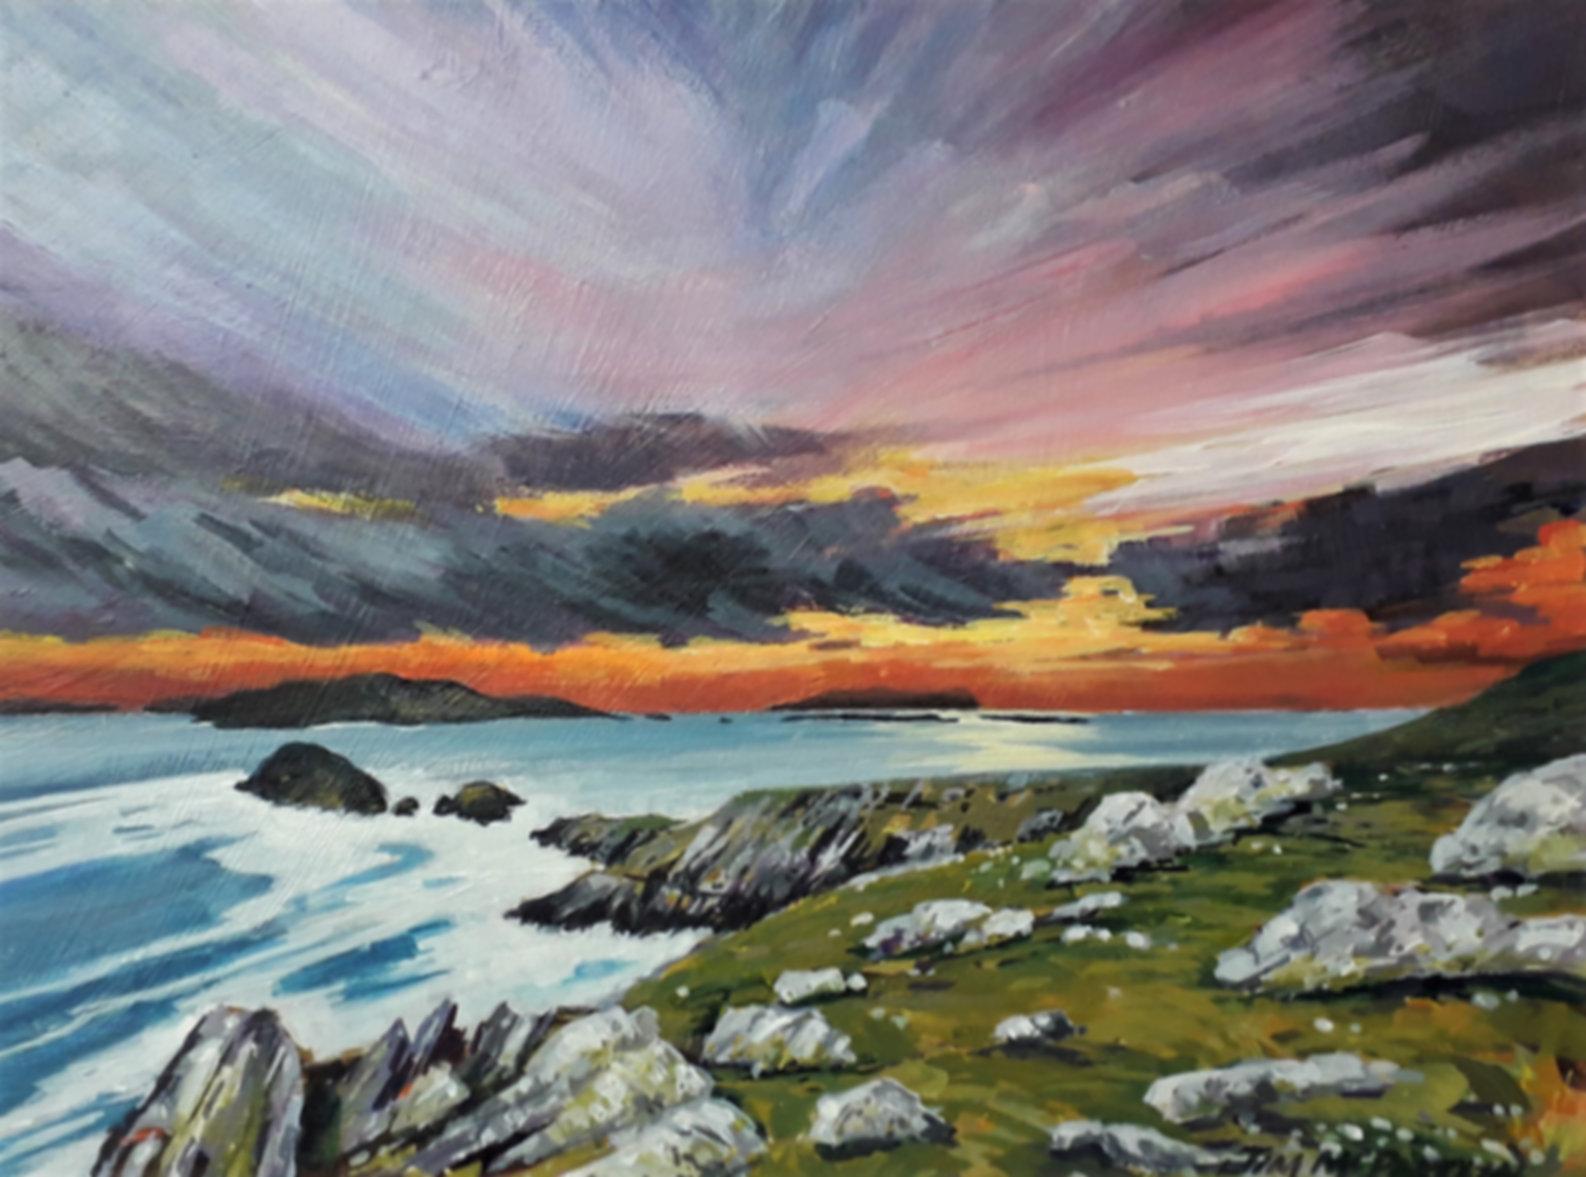 Painting of Slea Head, Dingle in Ireland